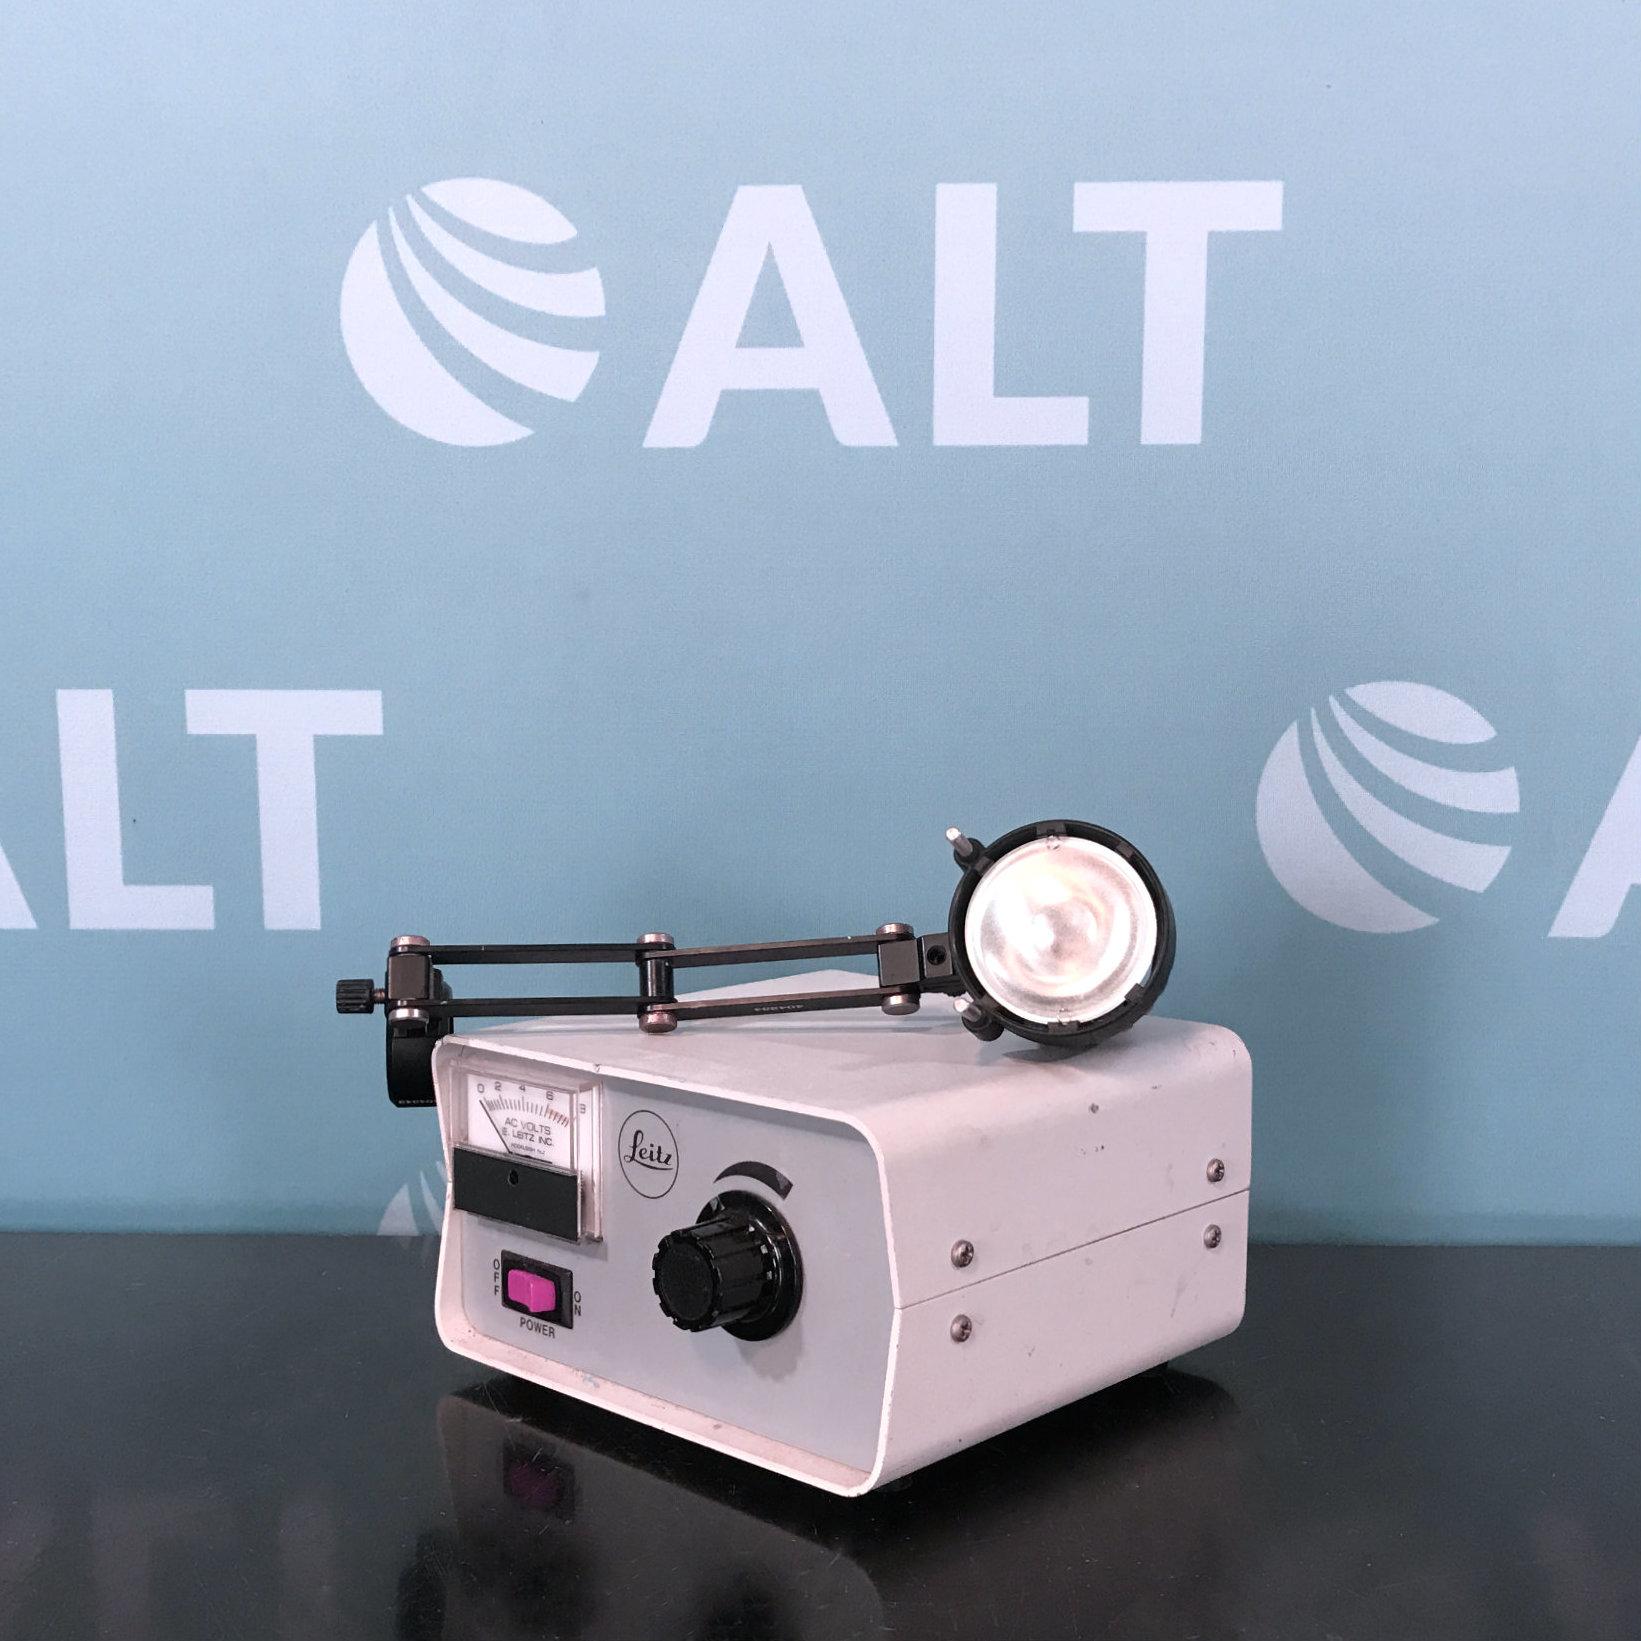 Leitz 050-261 Microscope Power Supply Image